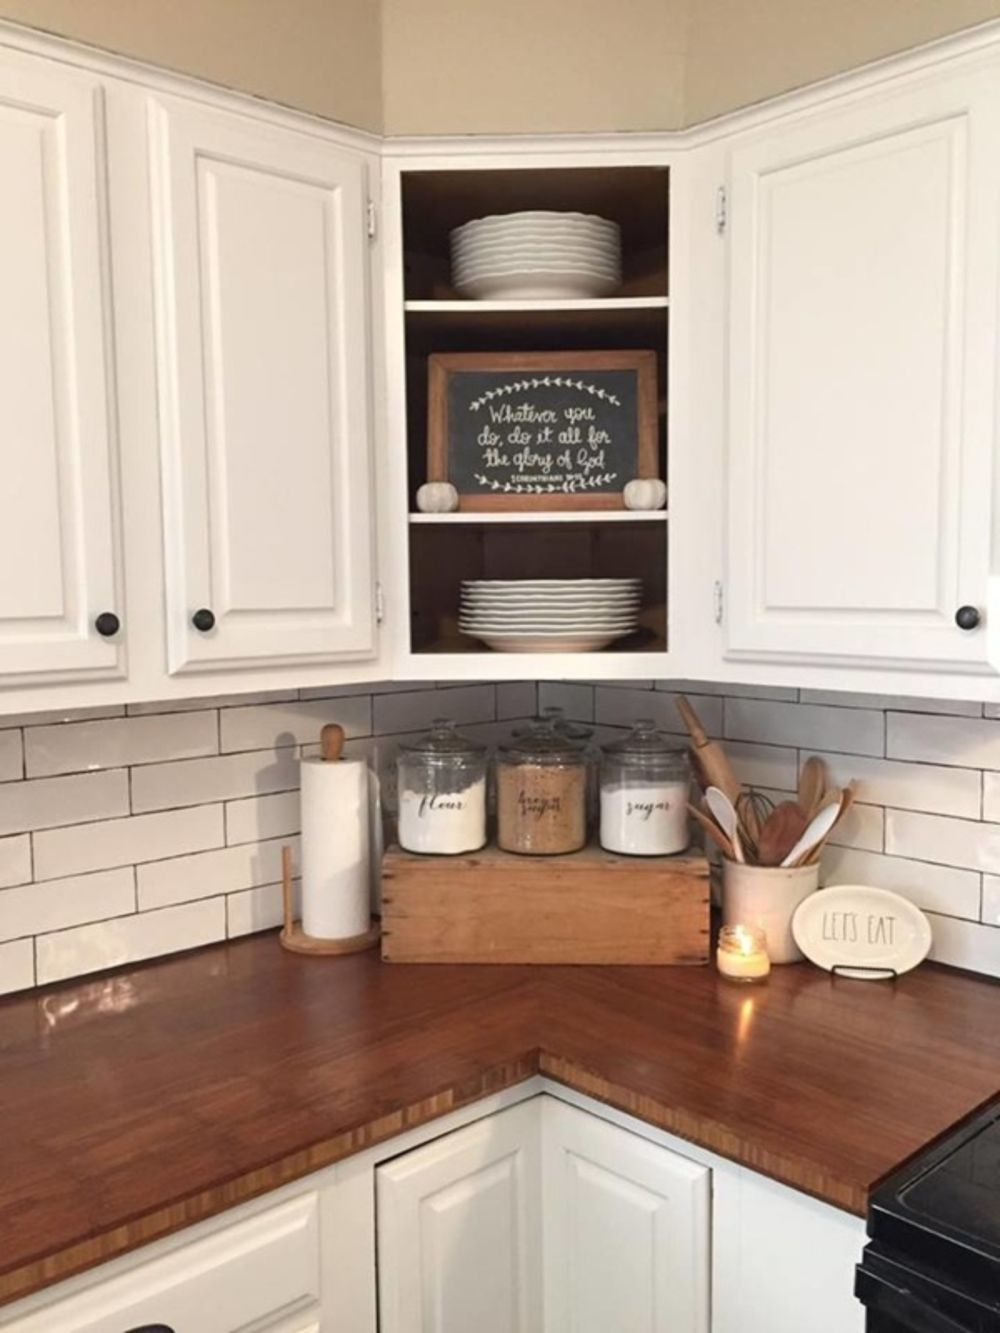 35 DIY Project Inspiration: Cozy Farmhouse Decor